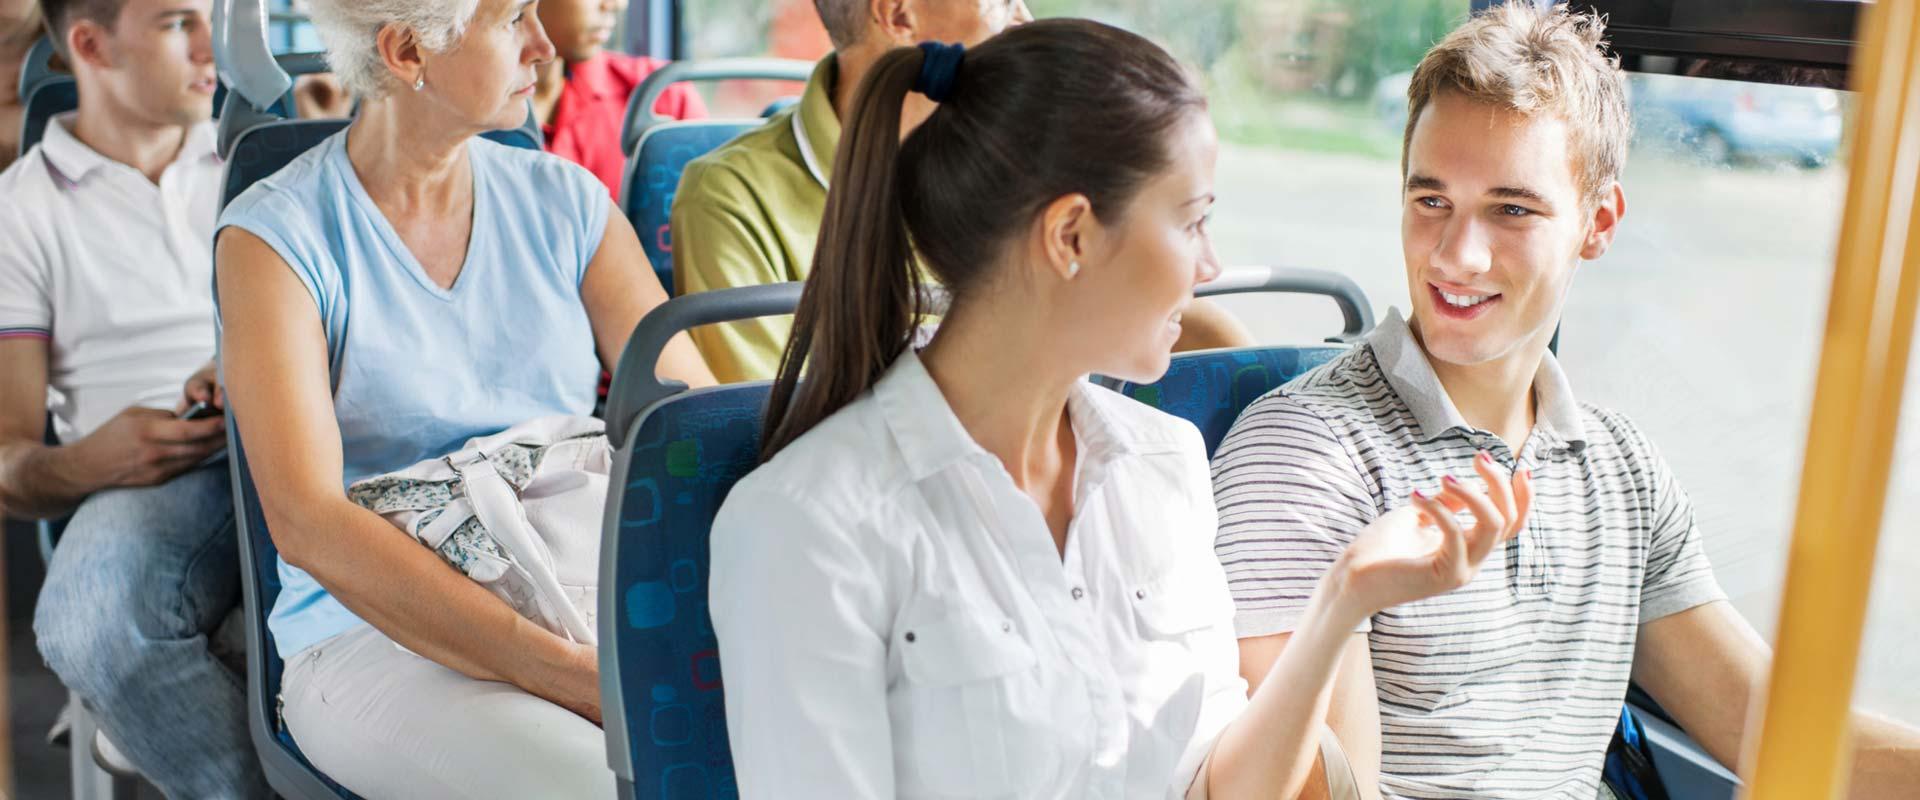 Tourist Bus to Niagara Falls, Canada